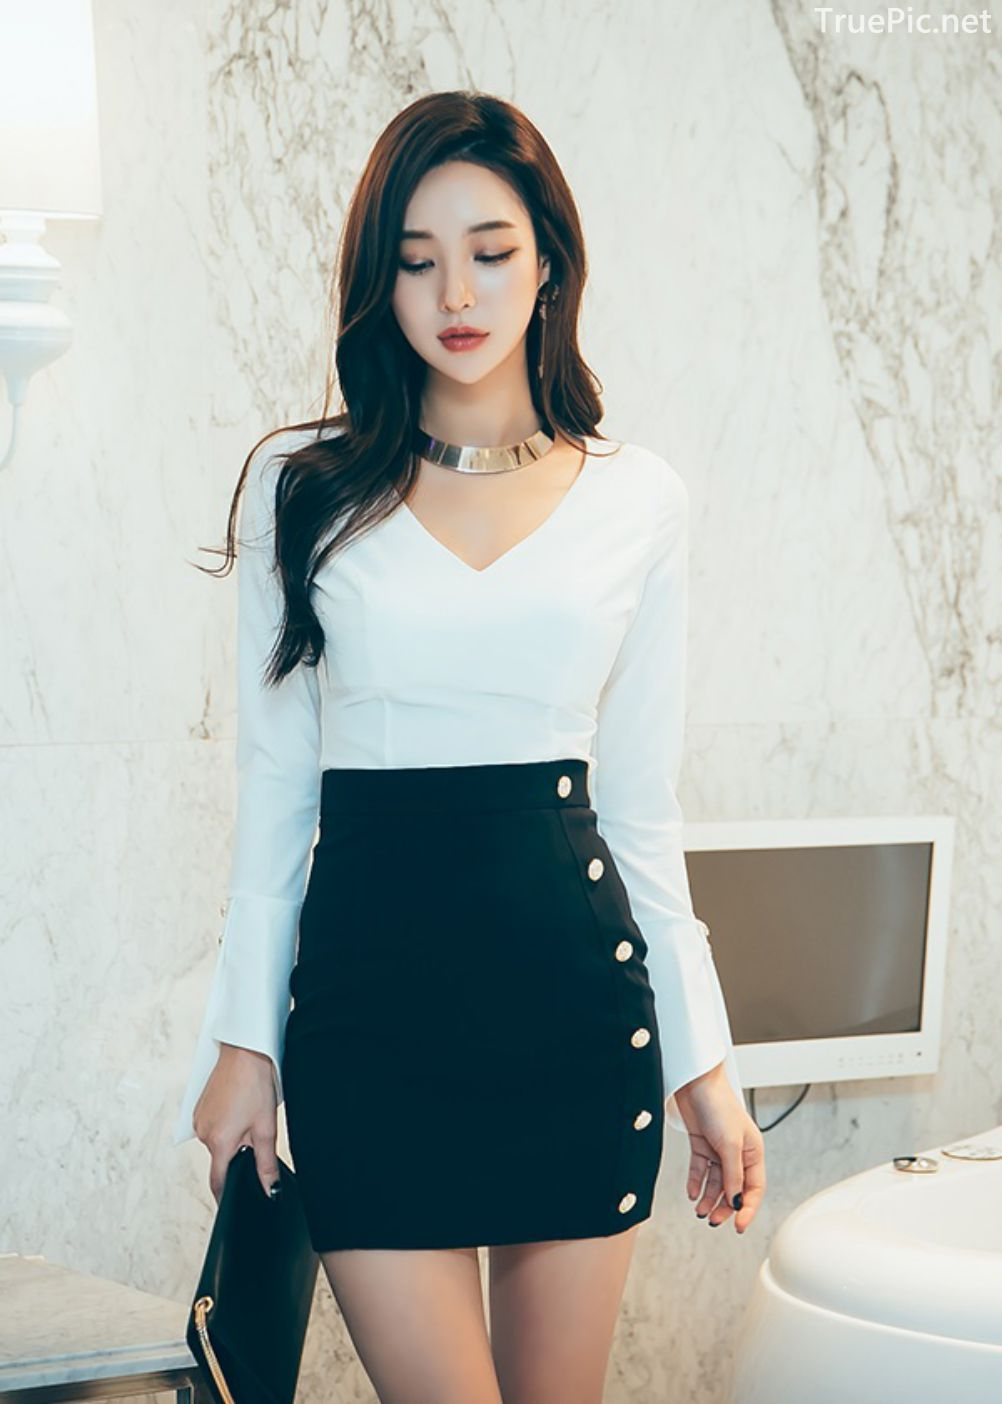 Korean Fashion Model - Park Da Hyun - Indoor Photoshoot Collection - TruePic.net - Picture 1